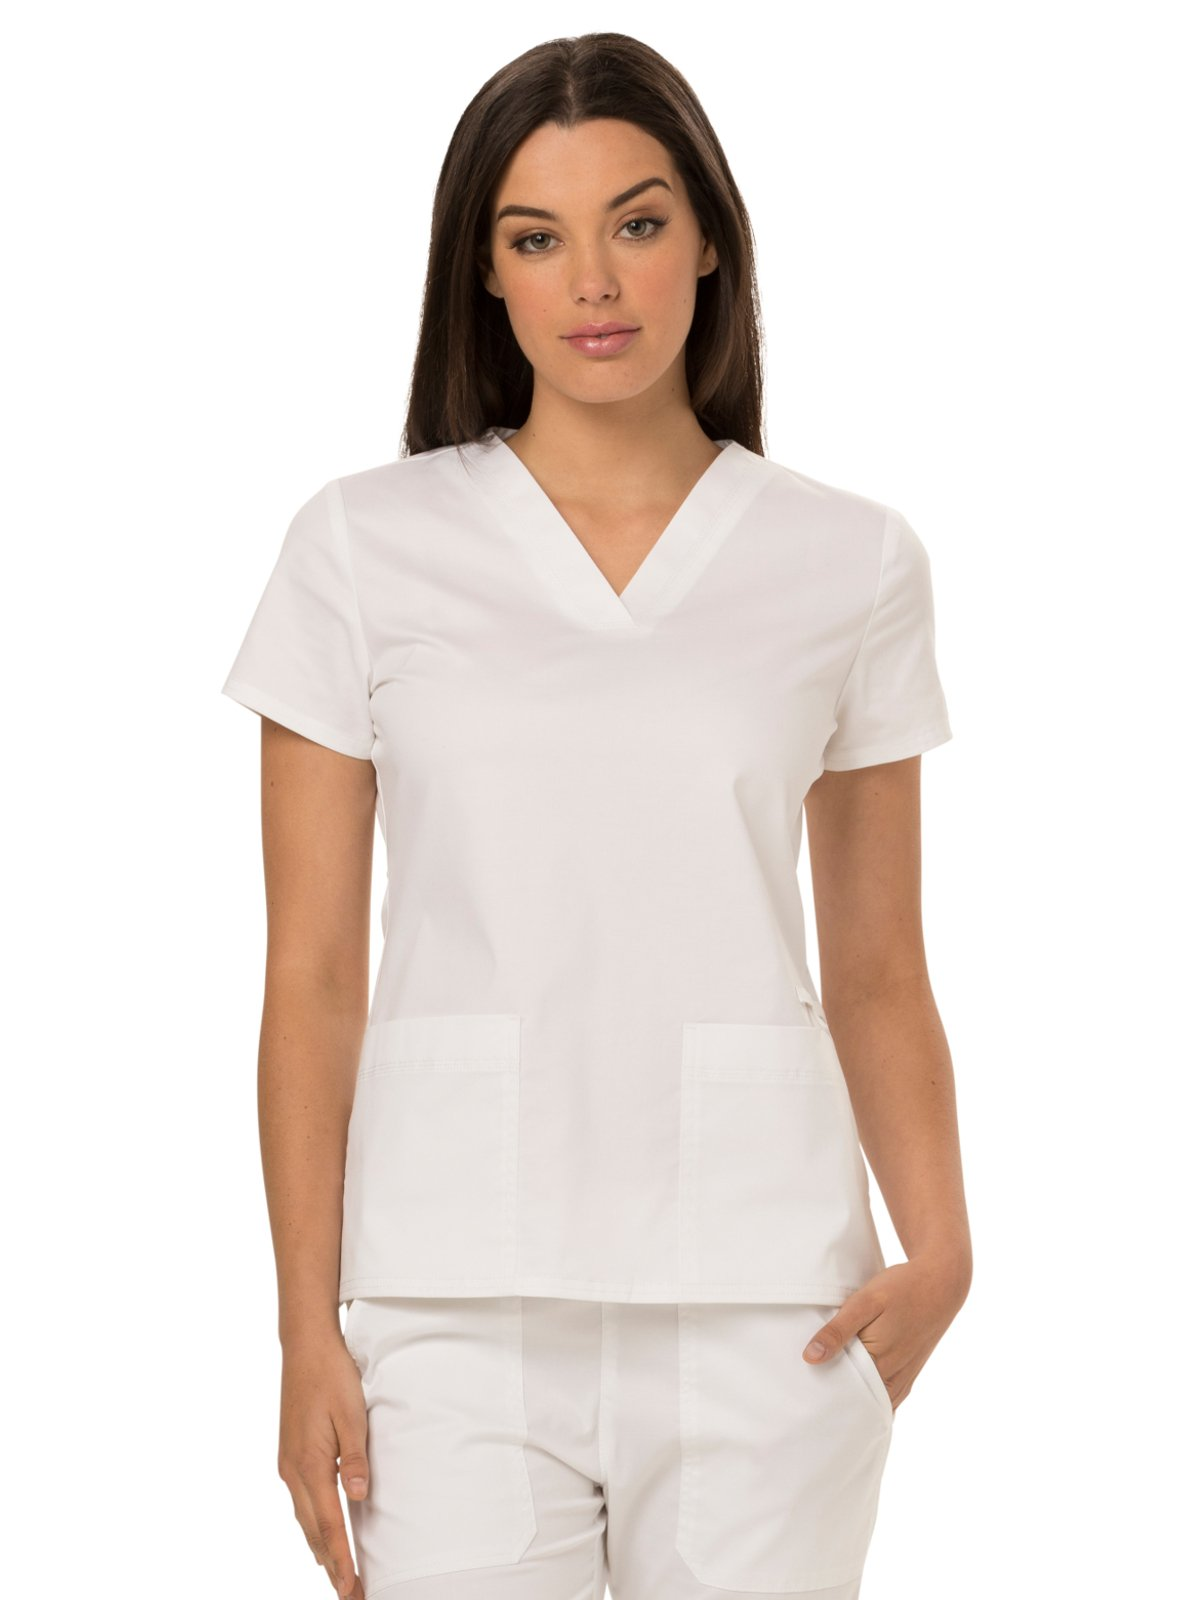 Dickies Gen Flex Women's V-Neck Solid Scrub Top X-Large White